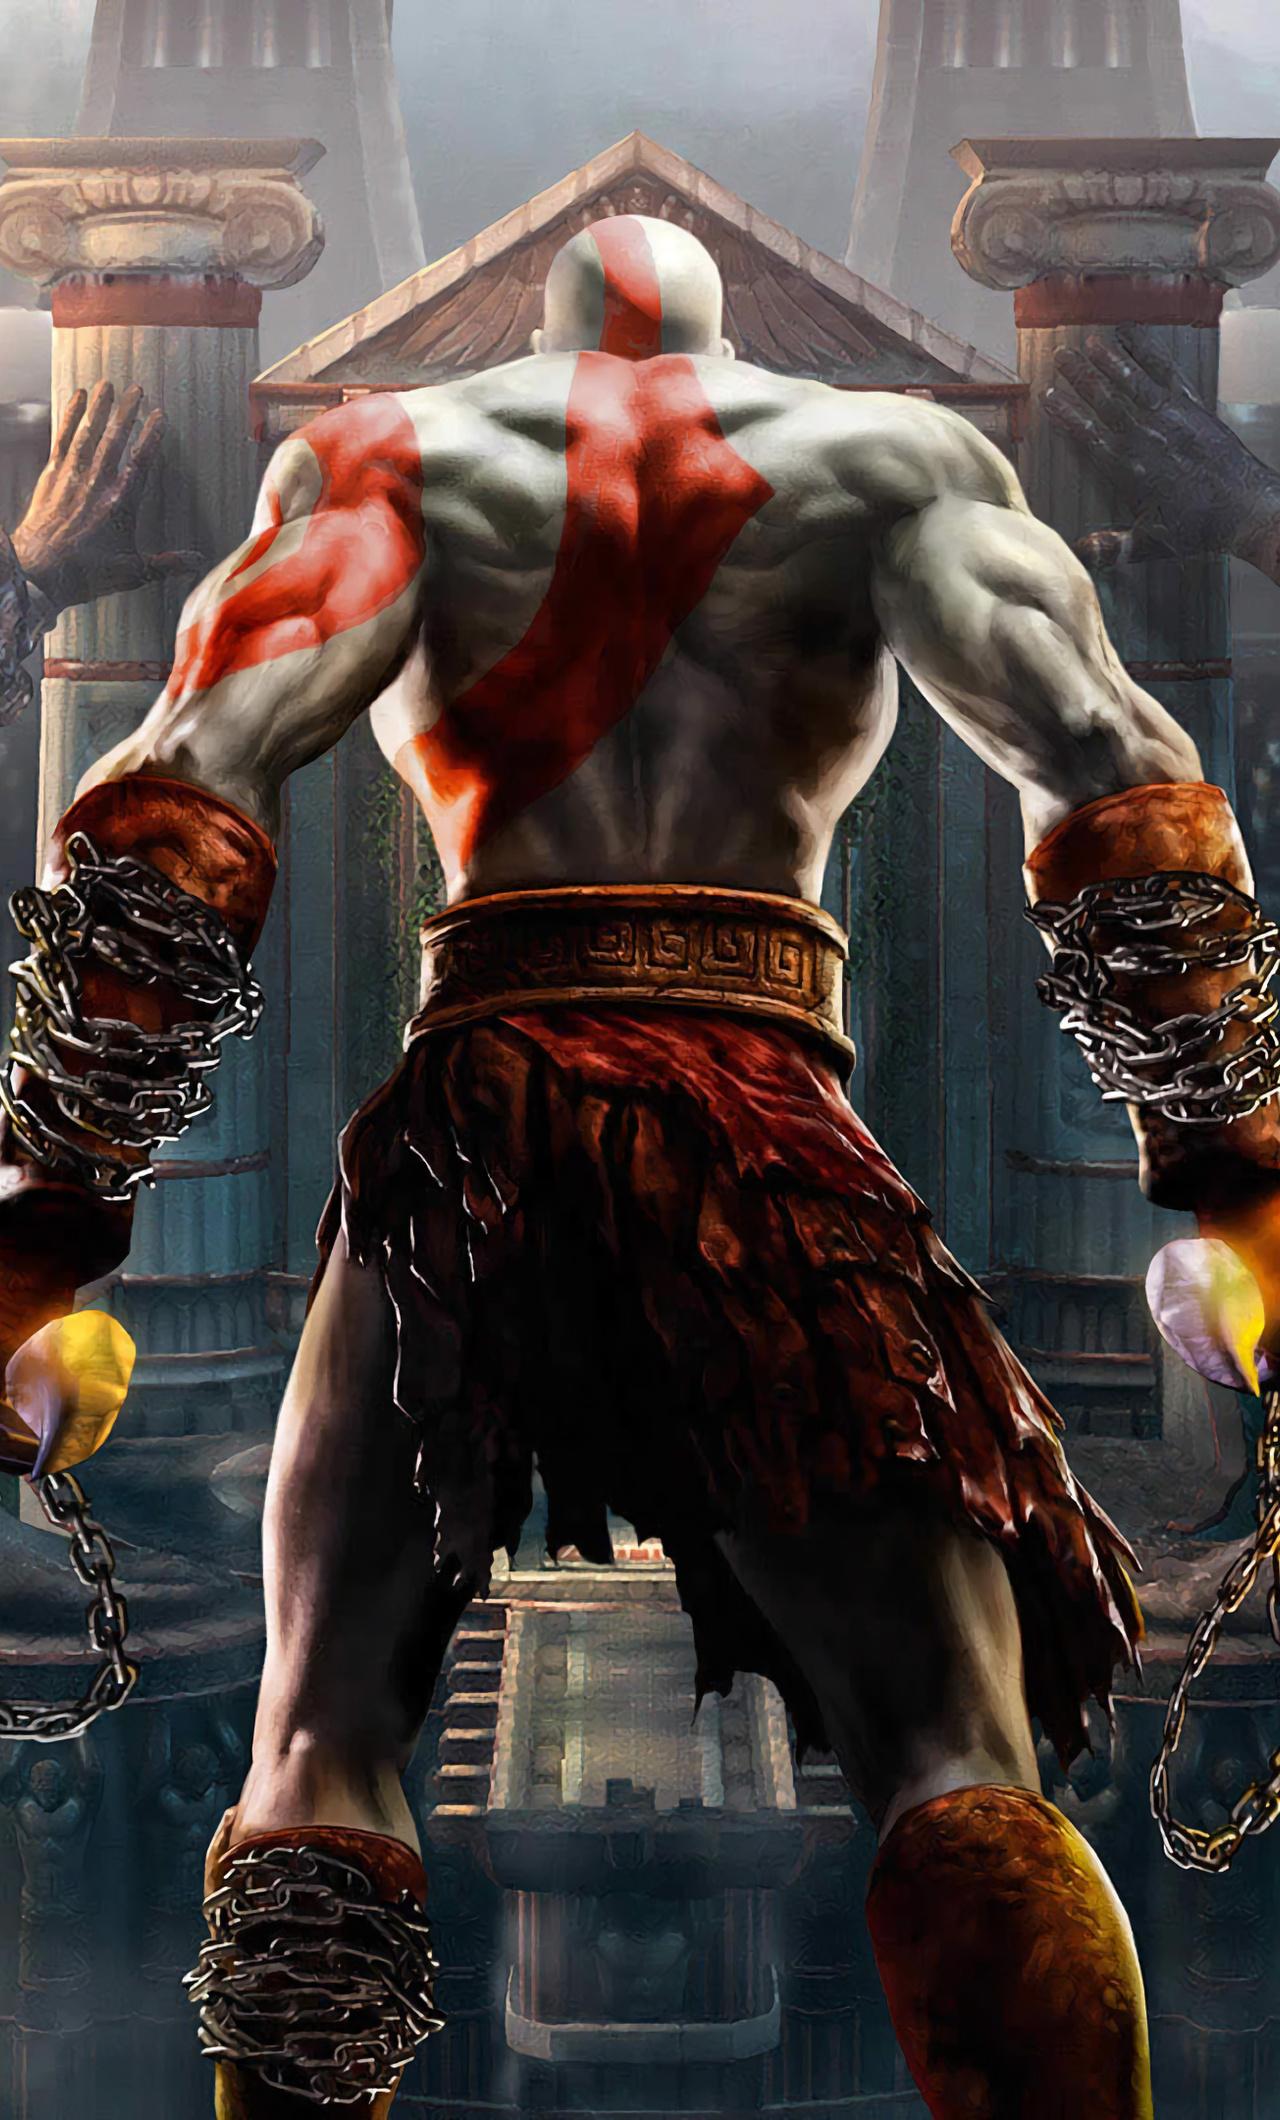 1280x2120 God Of War Kratos Iphone 6 Hd 4k Wallpapers